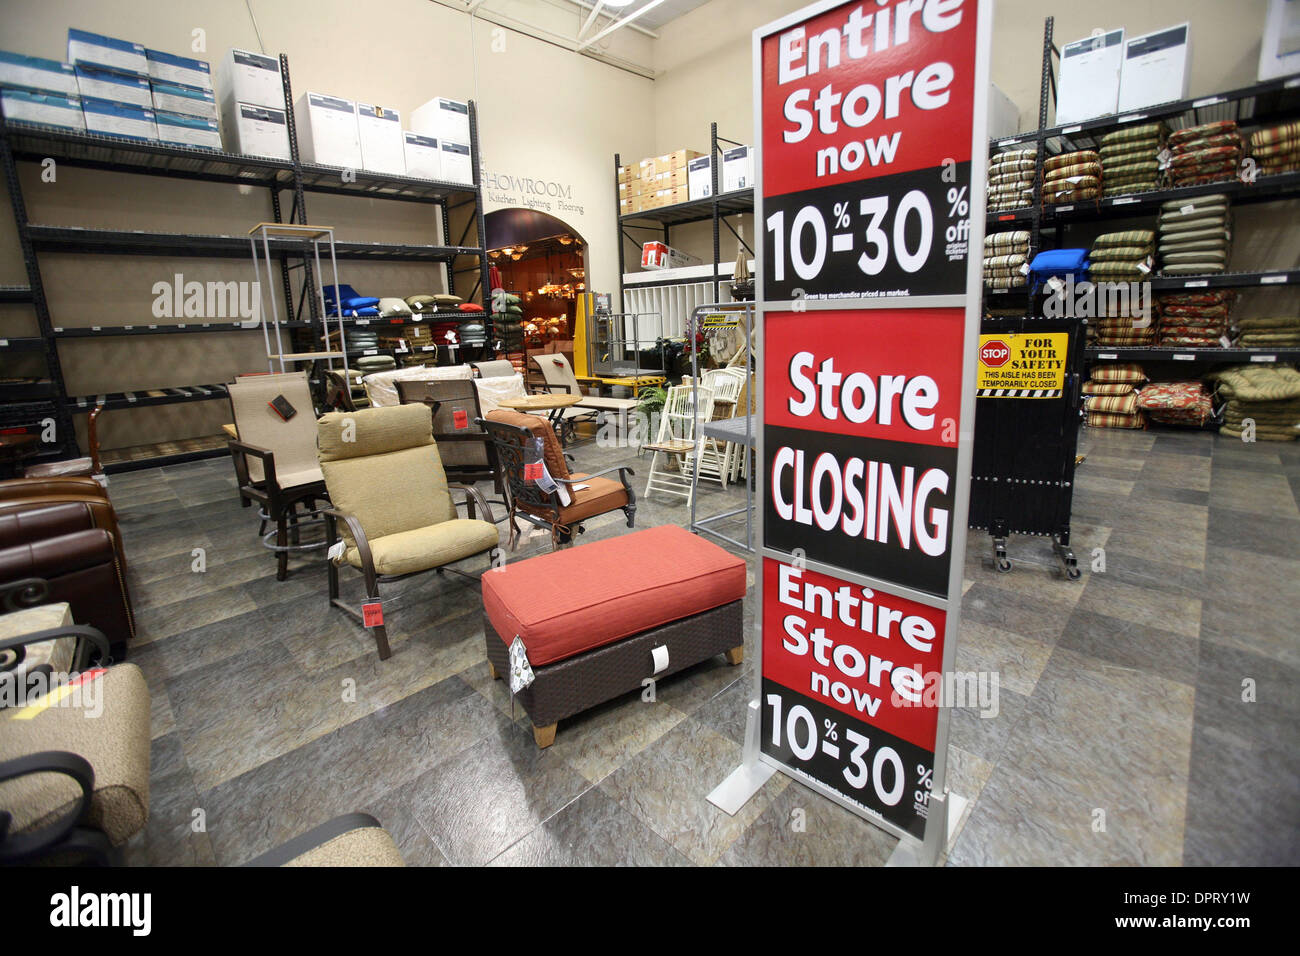 Charming Home Depot Design Expo Dallas Tx · Jan 27 2009   Los Angeles California Usa  Expo